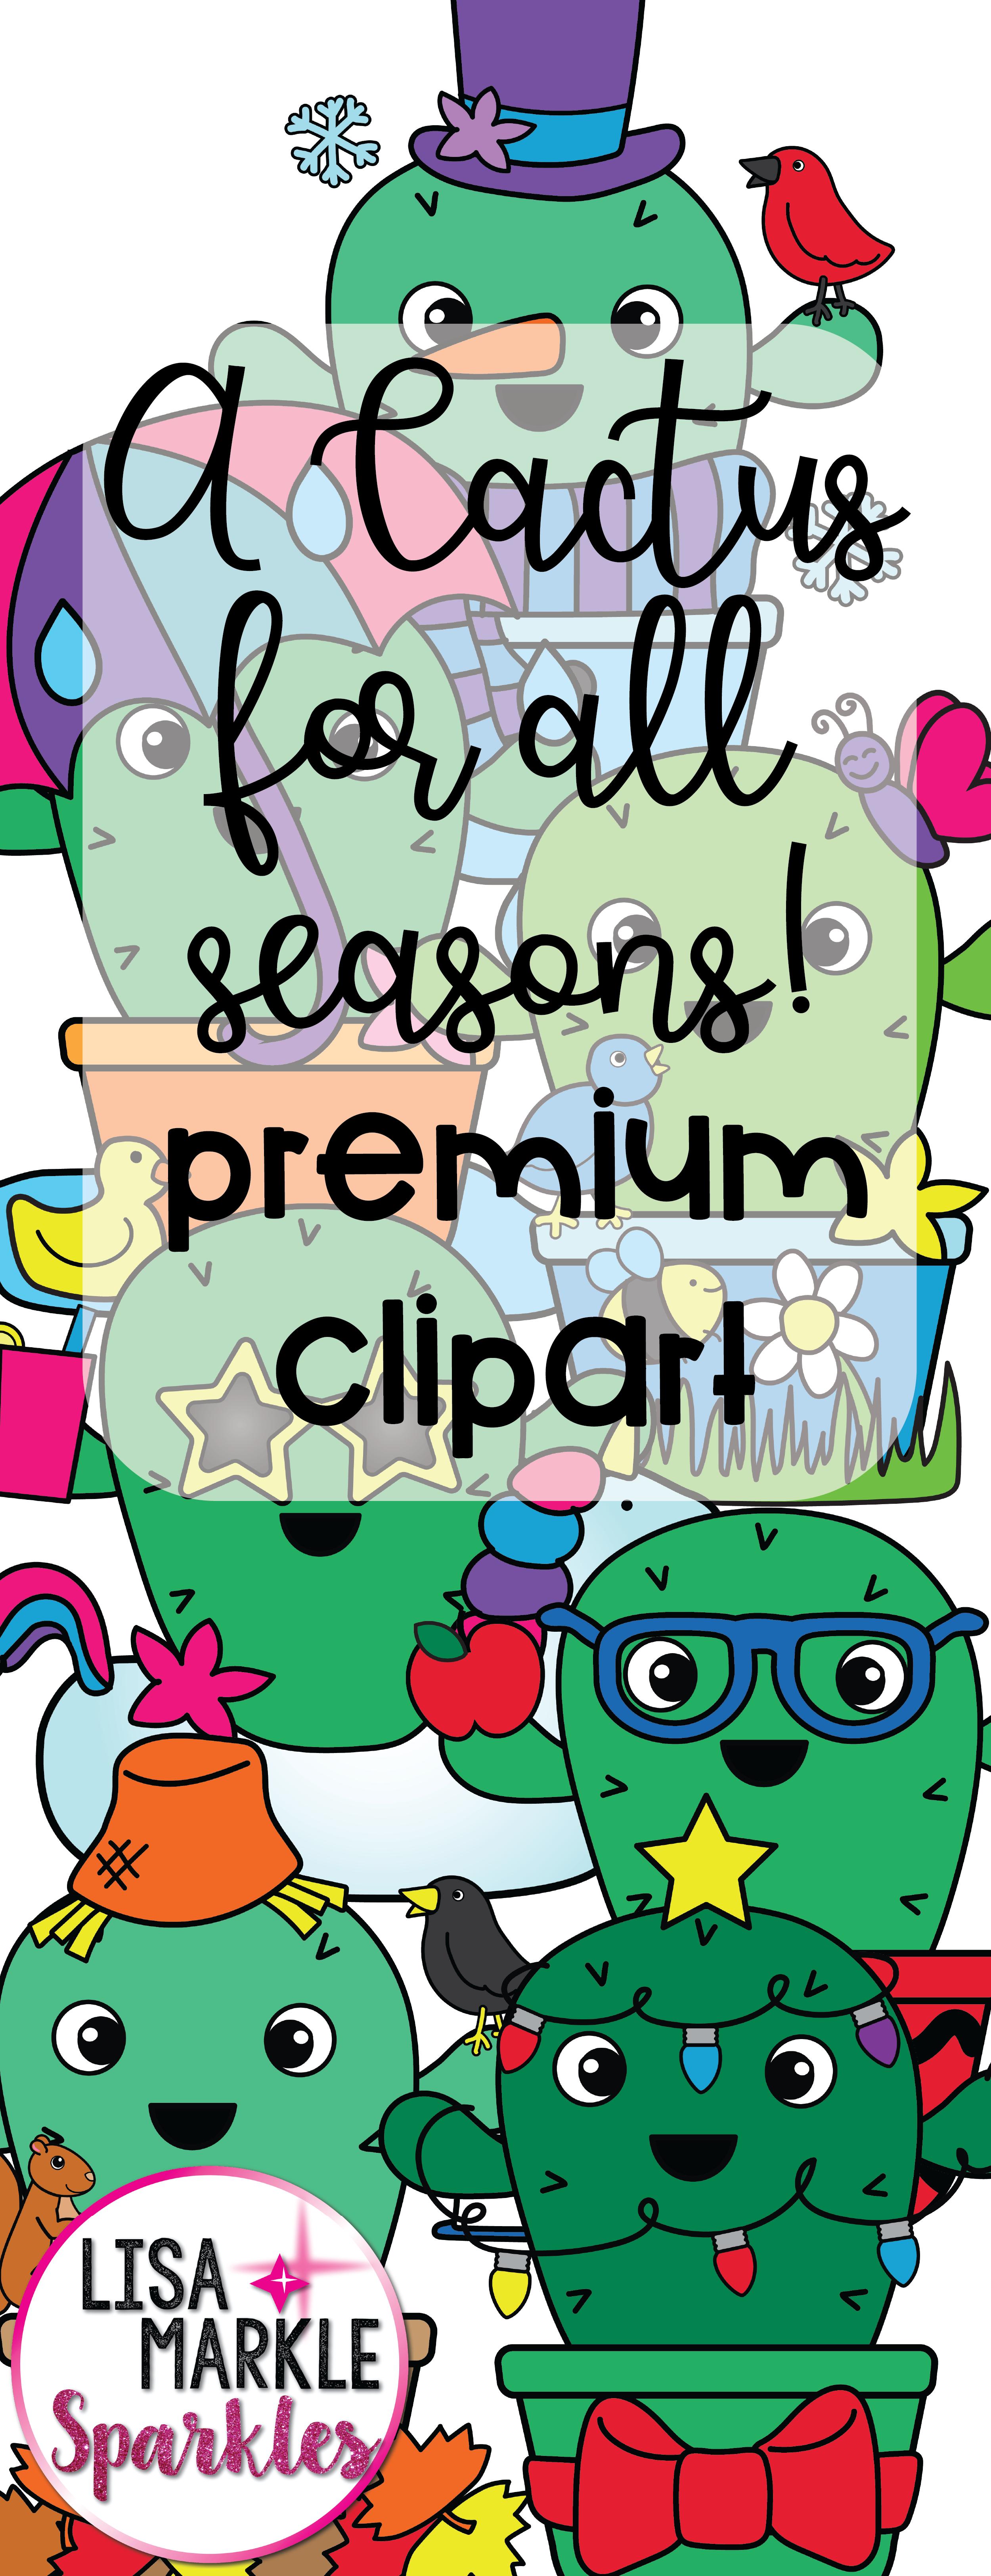 Seasons And Holidays Cactus Calendar Month Clipart Clip Art Preschool Fun Cactus Clipart